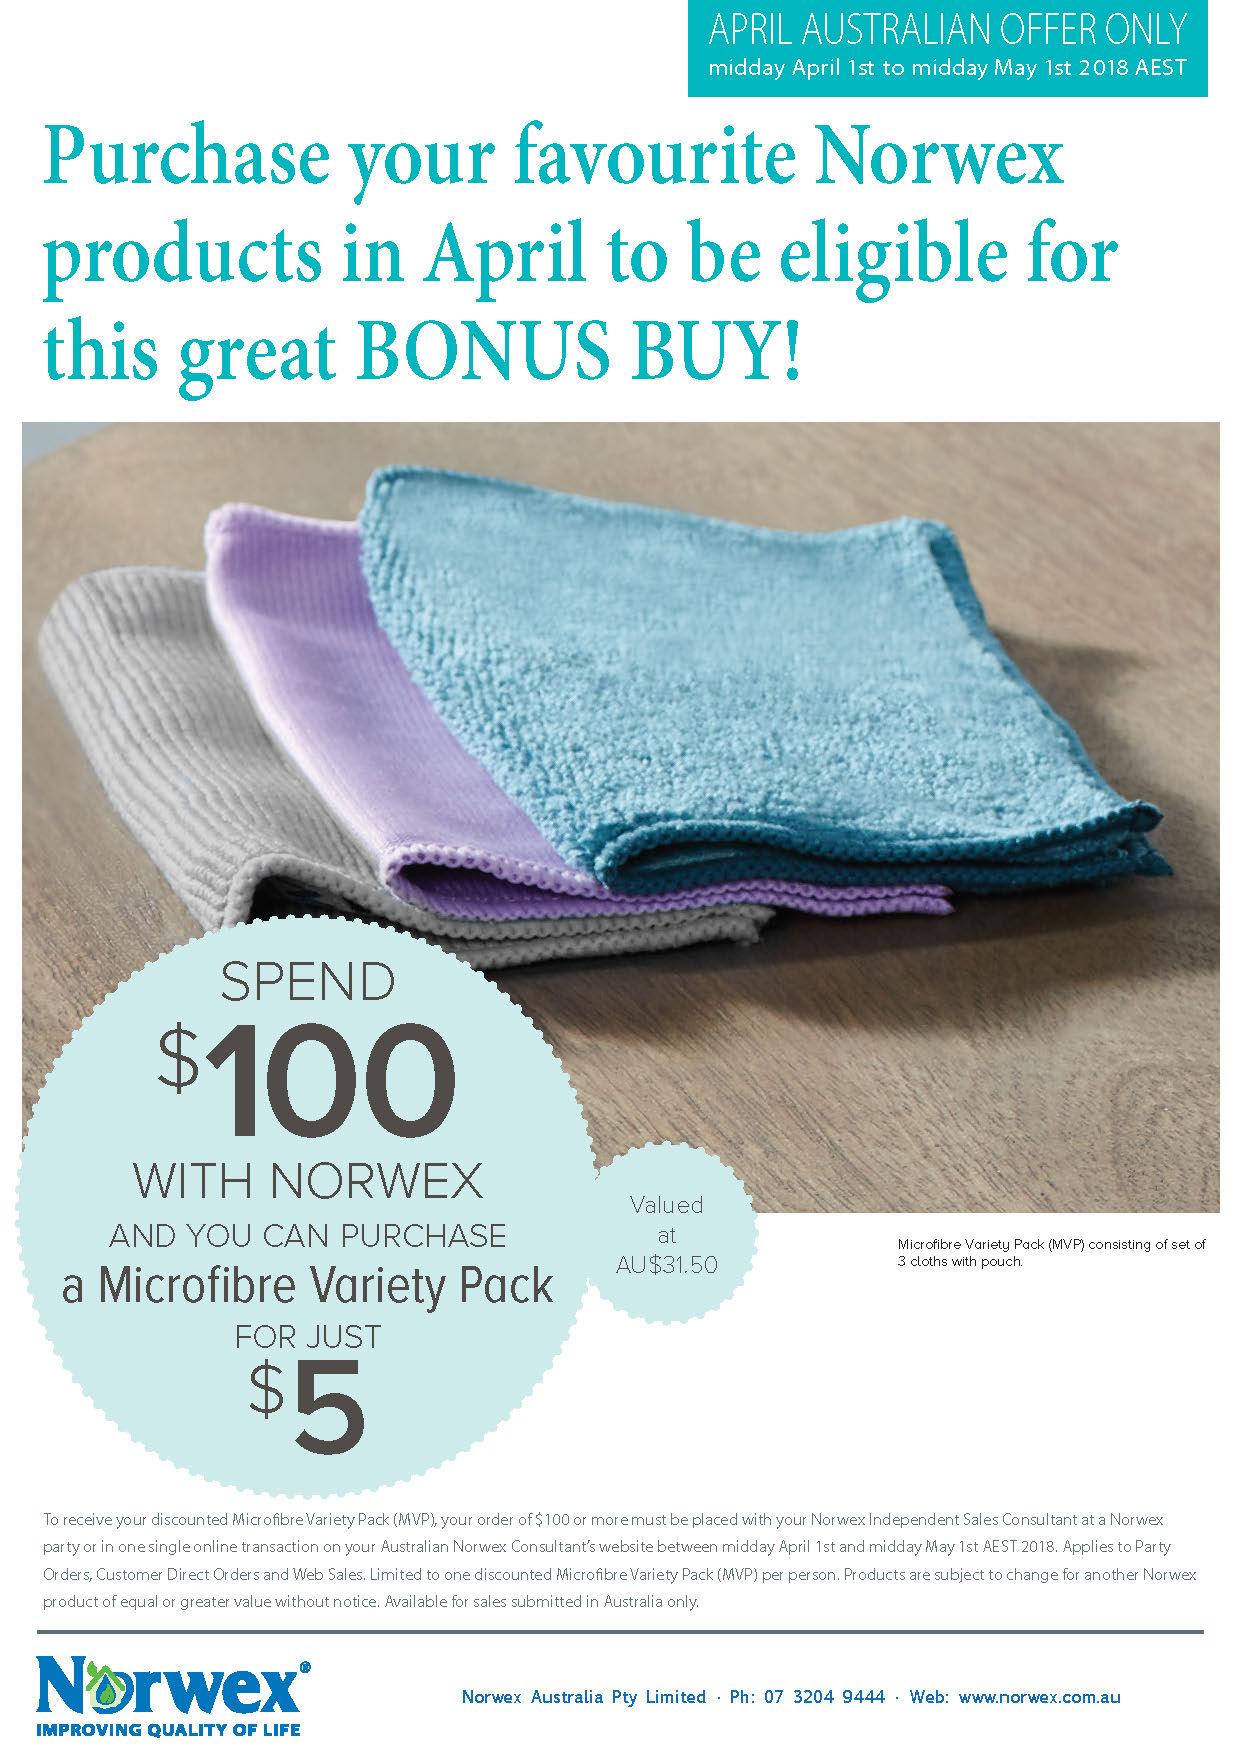 Norwex bonus buy, Australia only, April2018